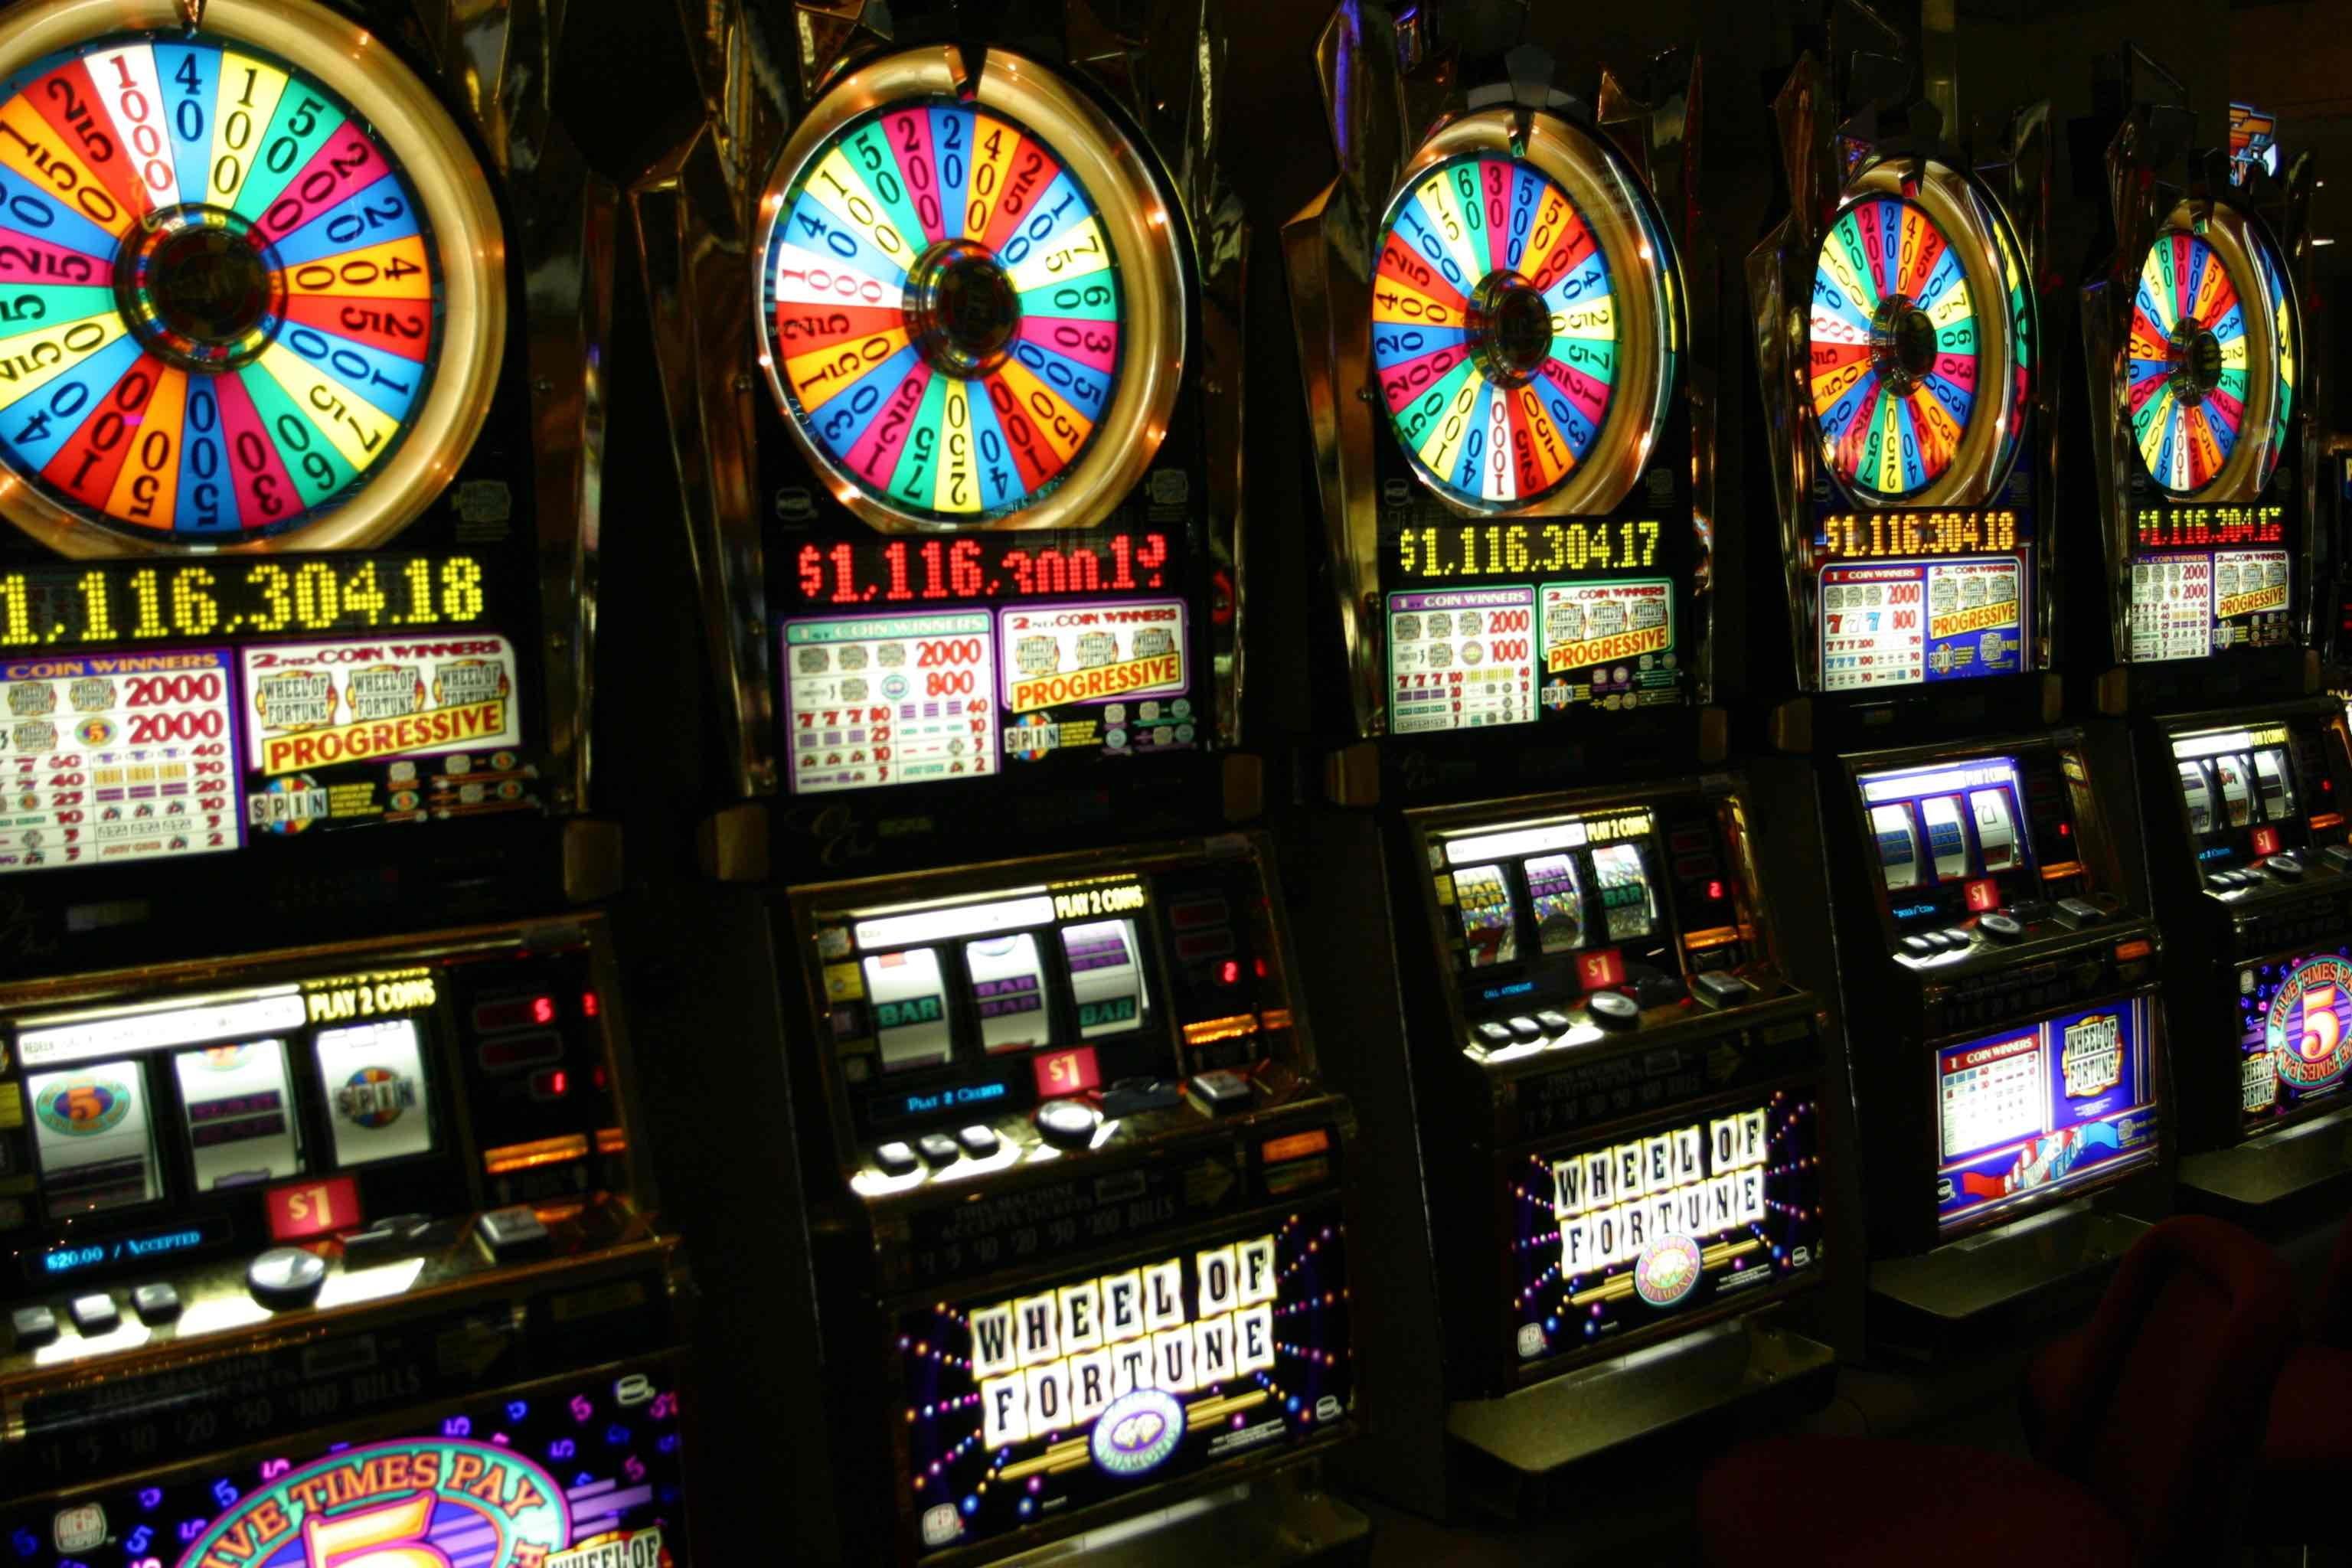 € 215 kazino mikroshēma bWin